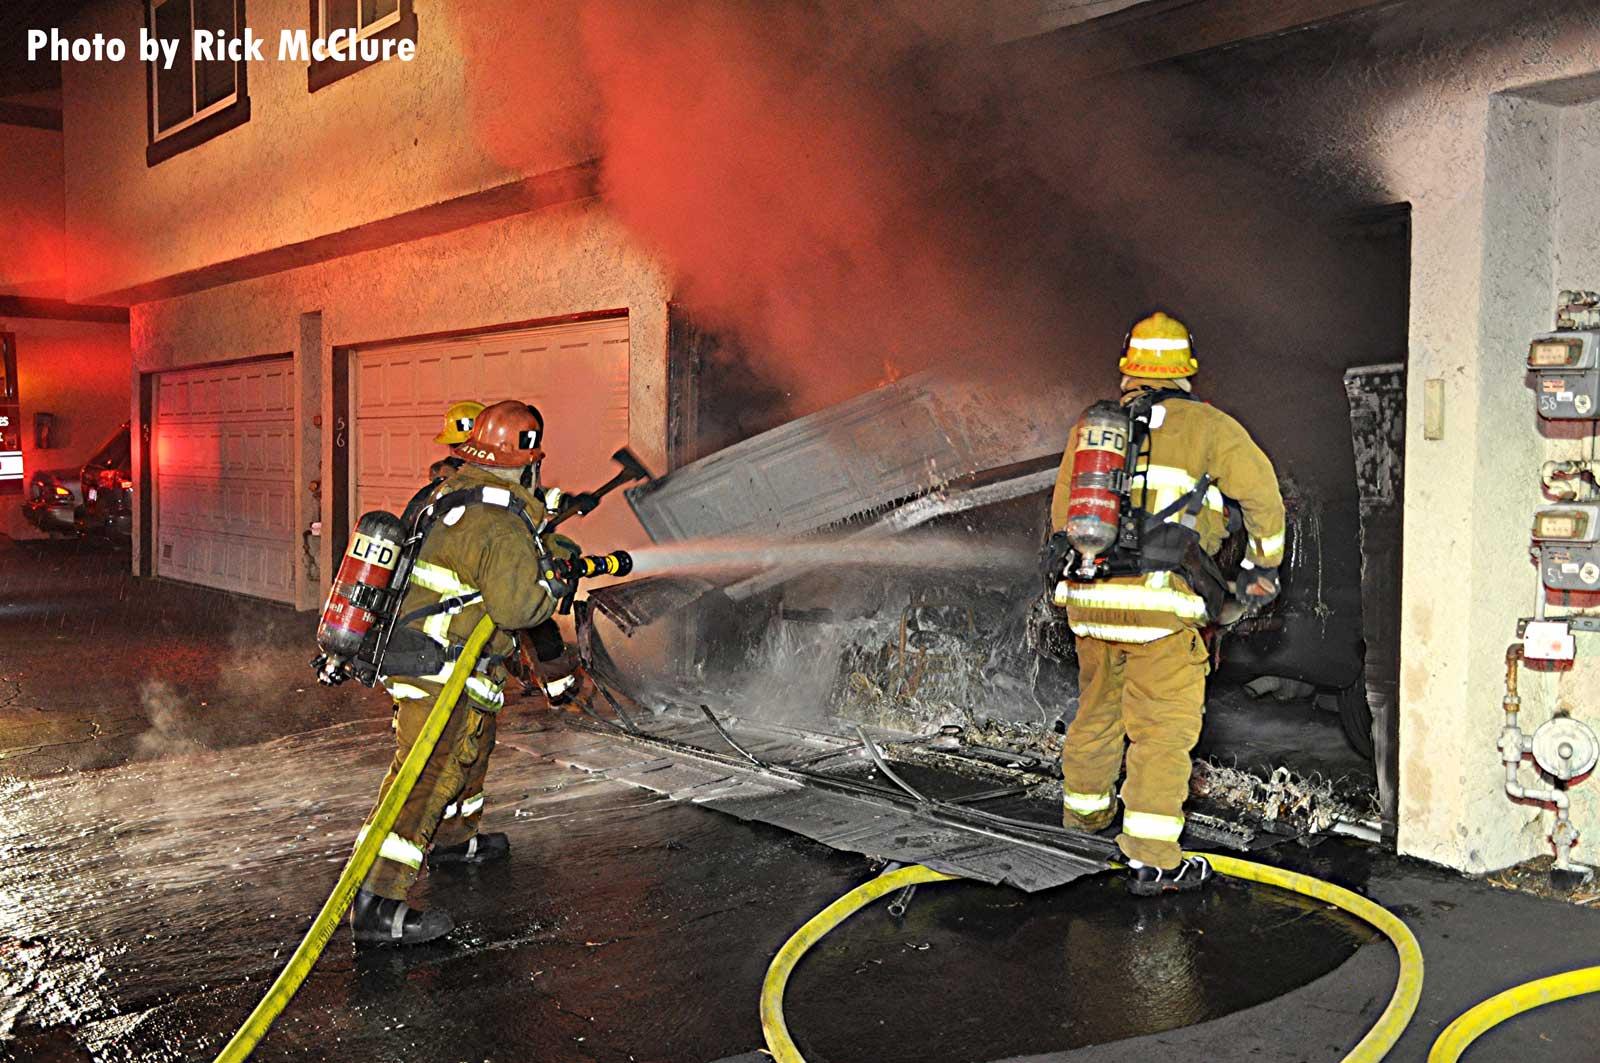 LAFD firefighters begin applying water to garage area